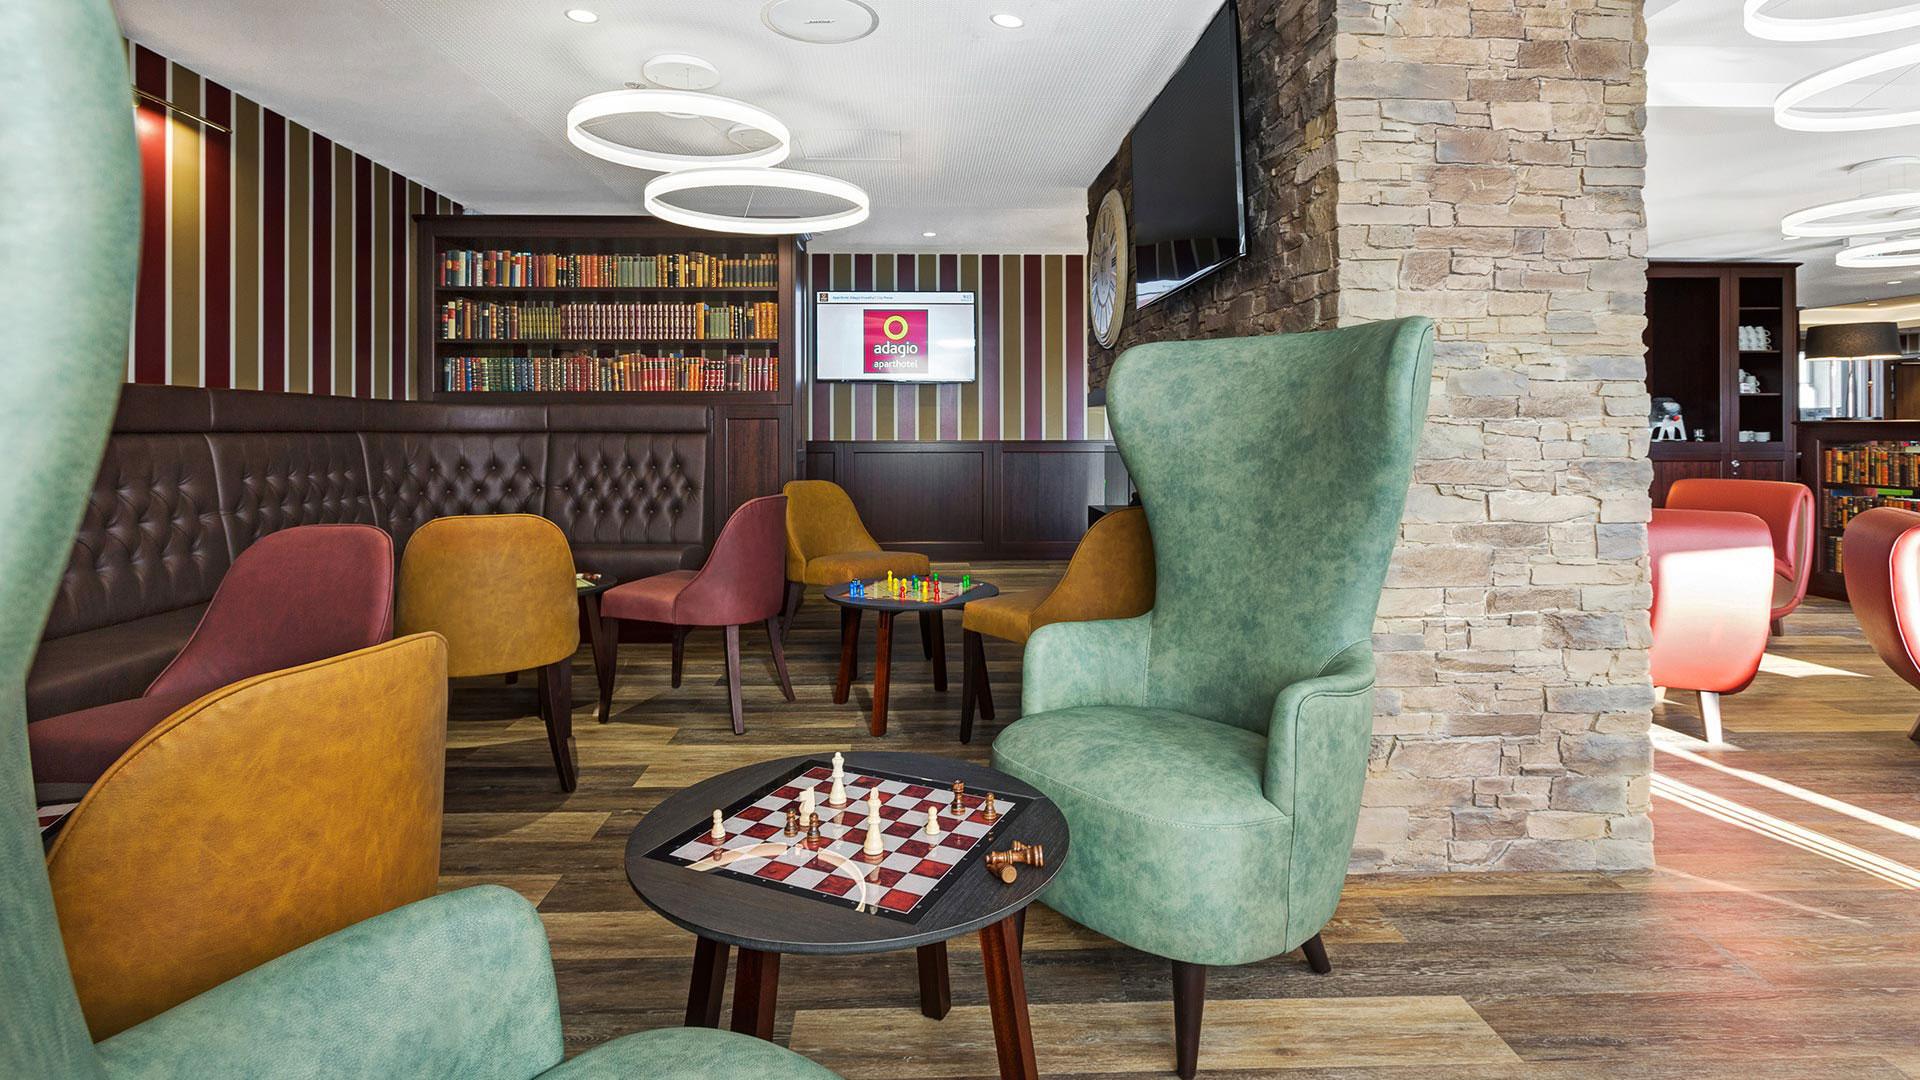 Foto der Lounge - 02 - Aparthotel Frankfurt City